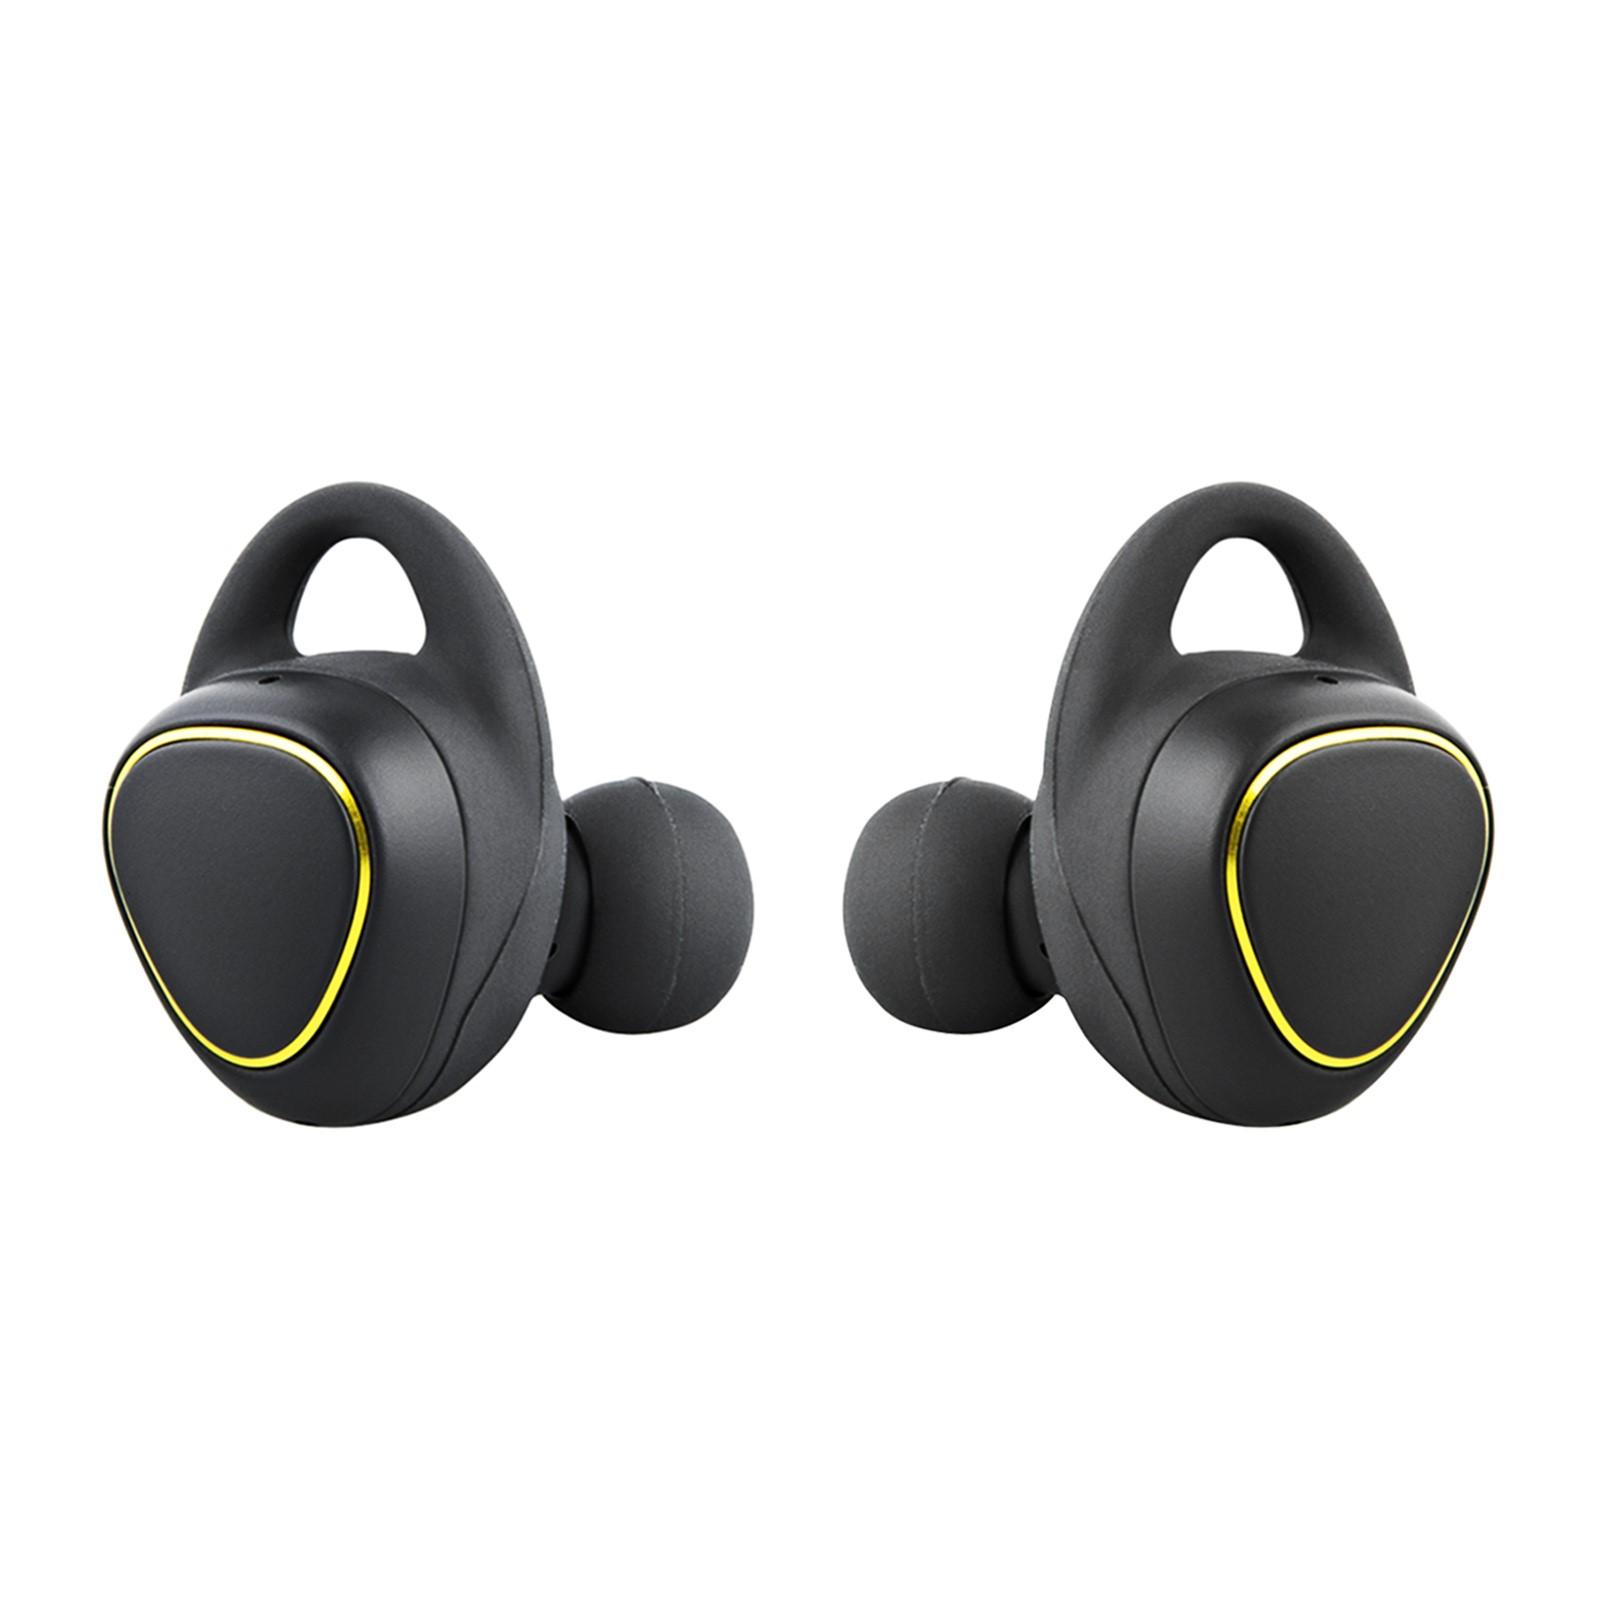 Samsung Gear IconX Cordfree Fitness Earbuds with Activity Tracker (Black) SAM-ICONX-BK-B1-LP